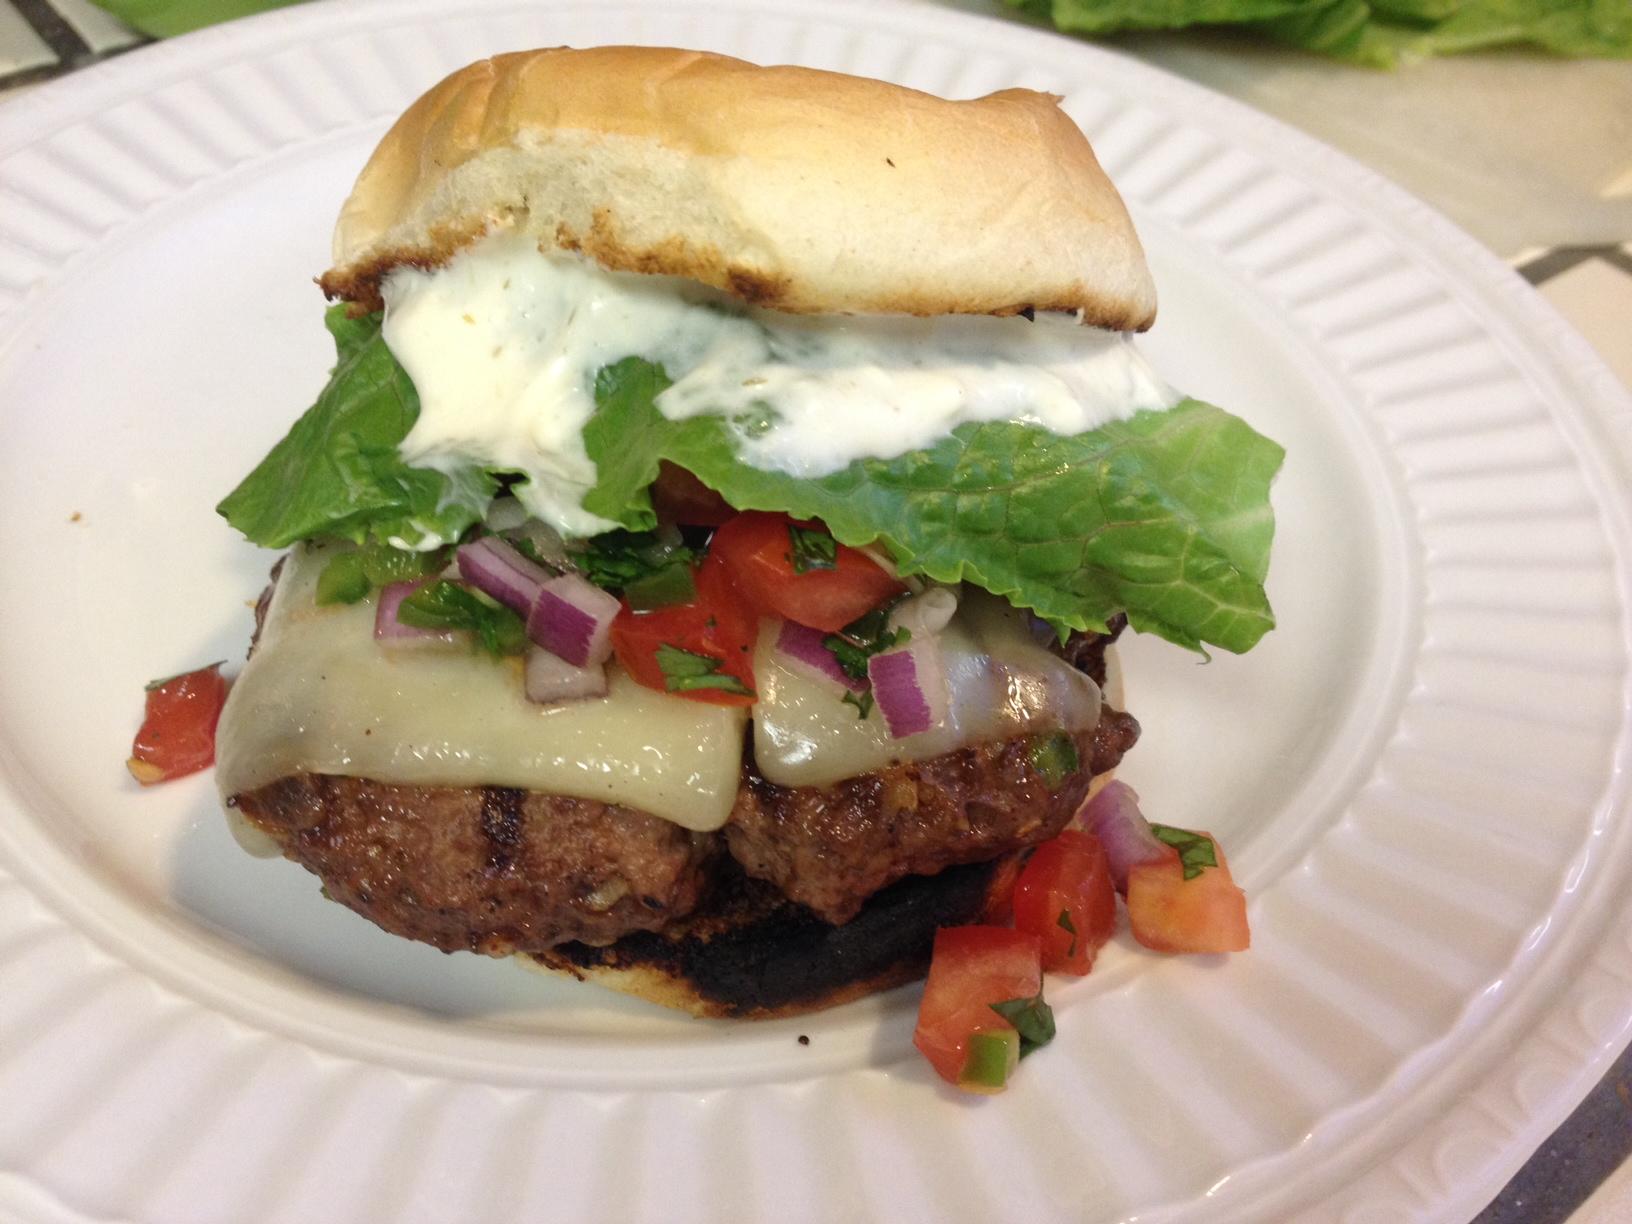 Taco Burger[/caption]